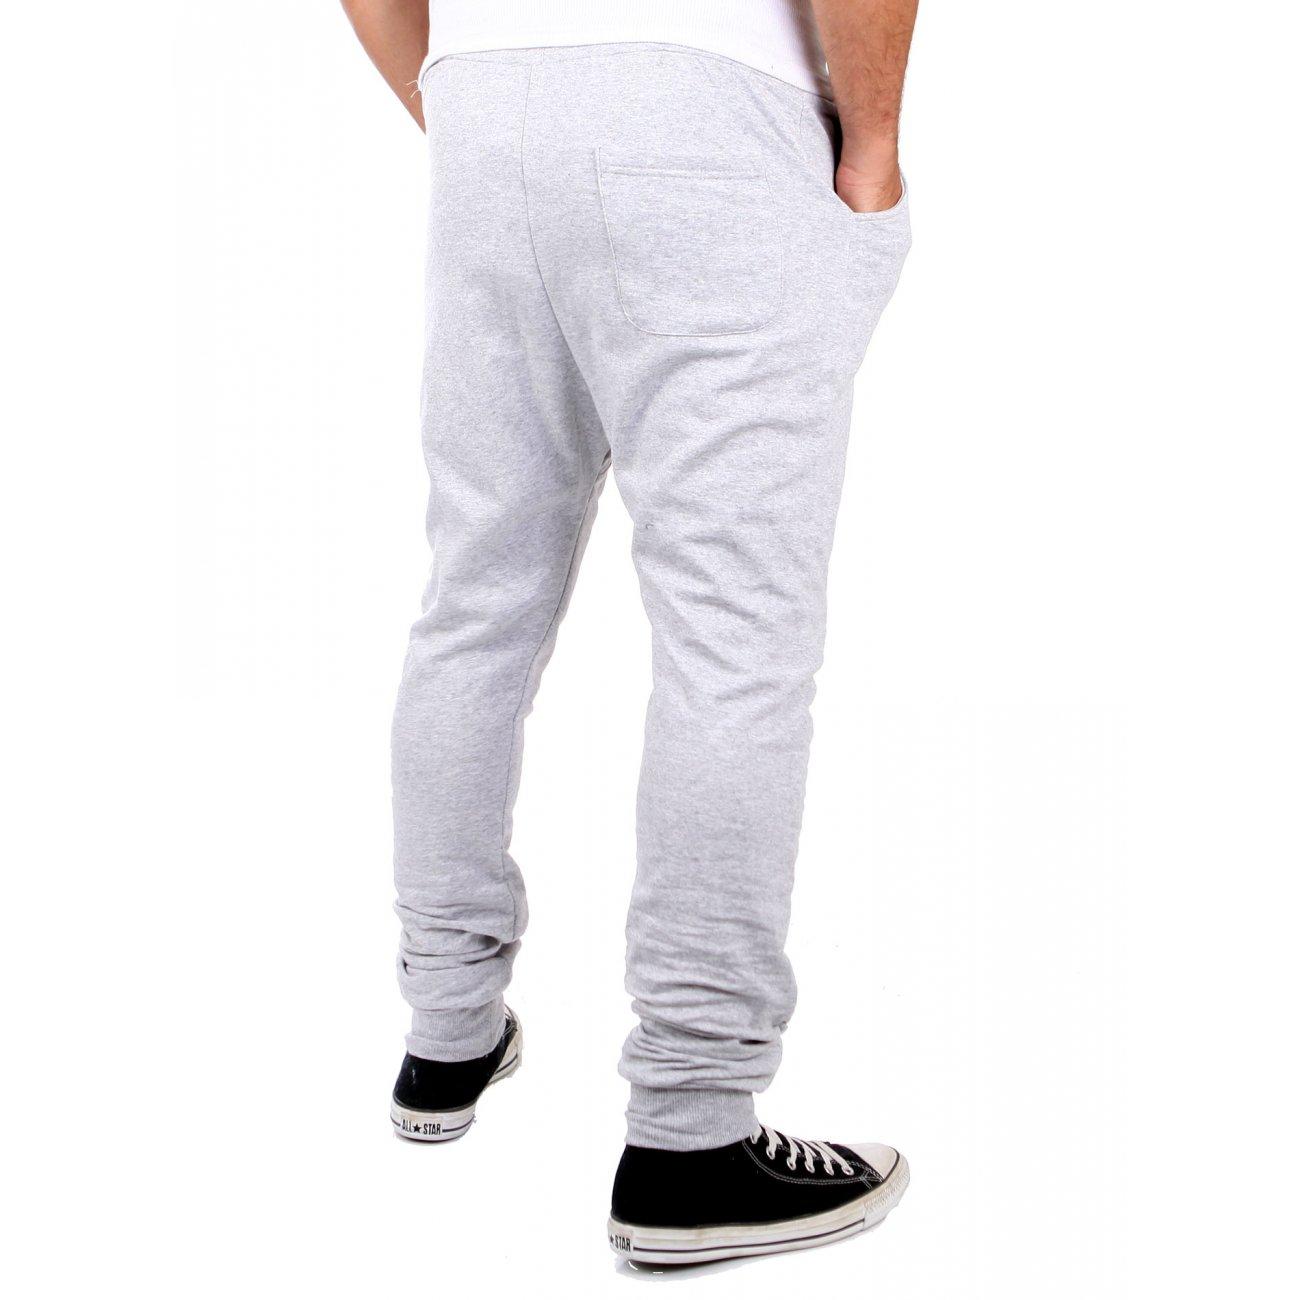 tazzio jogginghose herren deep low crotch club wear sweatpant tz 502. Black Bedroom Furniture Sets. Home Design Ideas